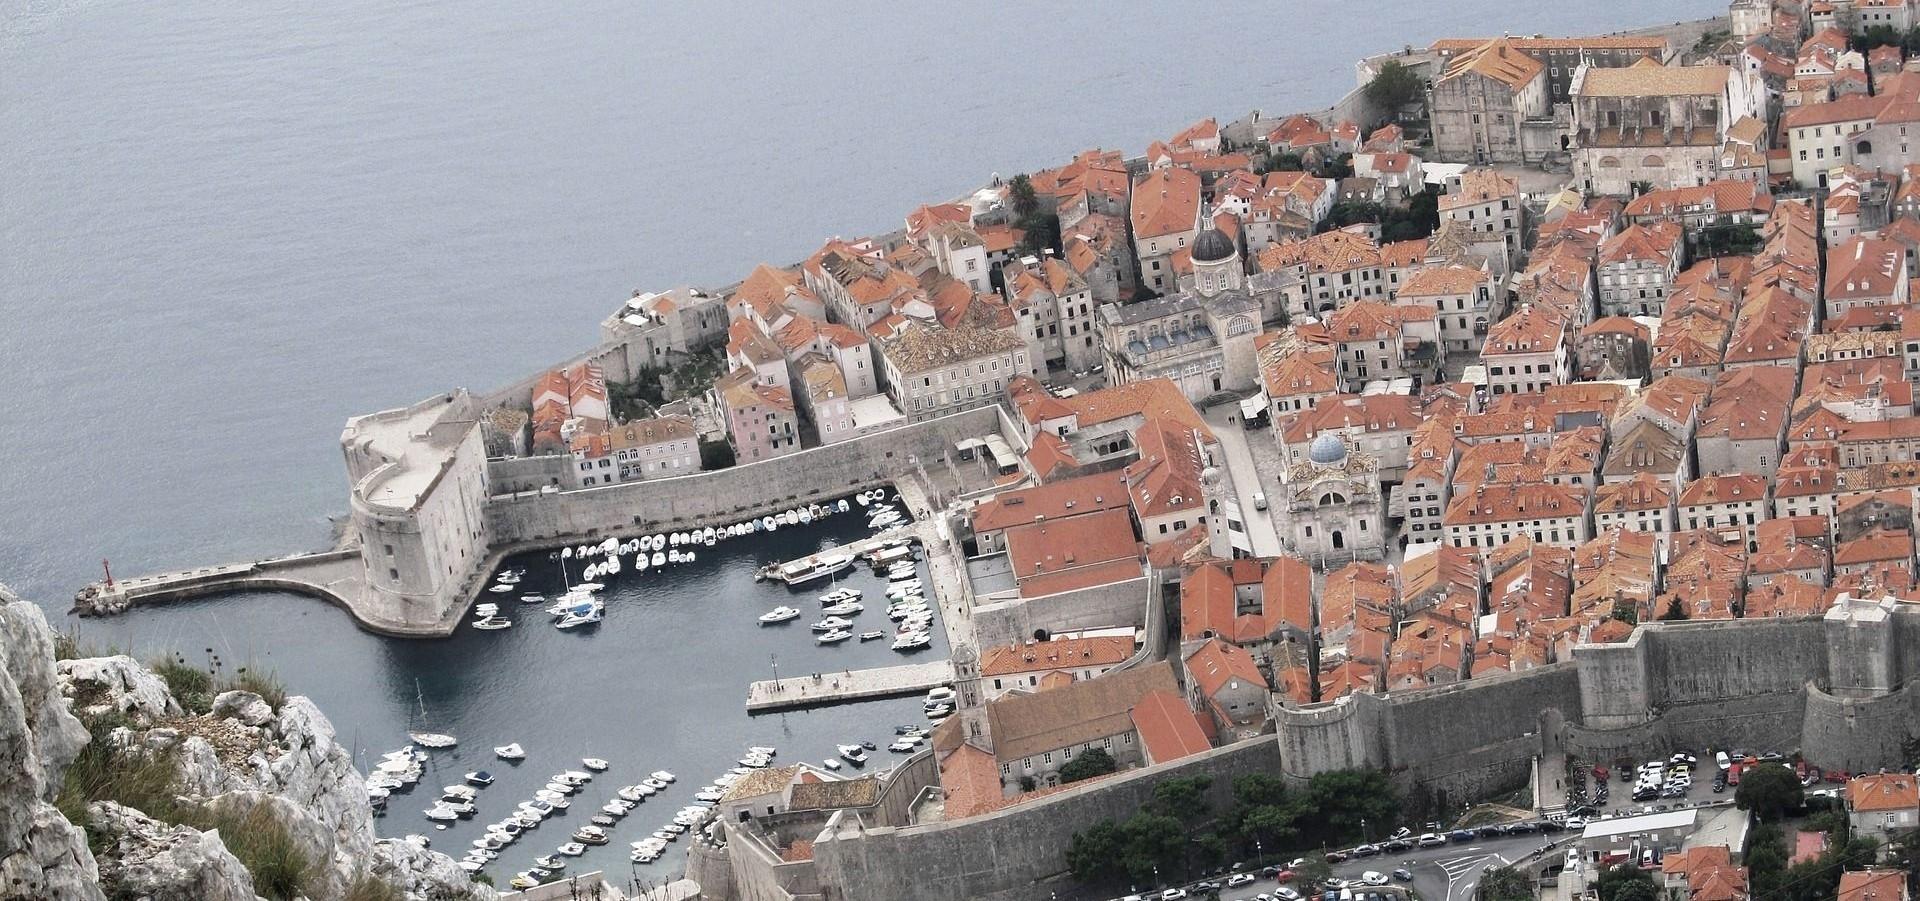 Documenta: Za napad na Dubrovnik i ratni zločin dosad osuđene samo dvije osobe